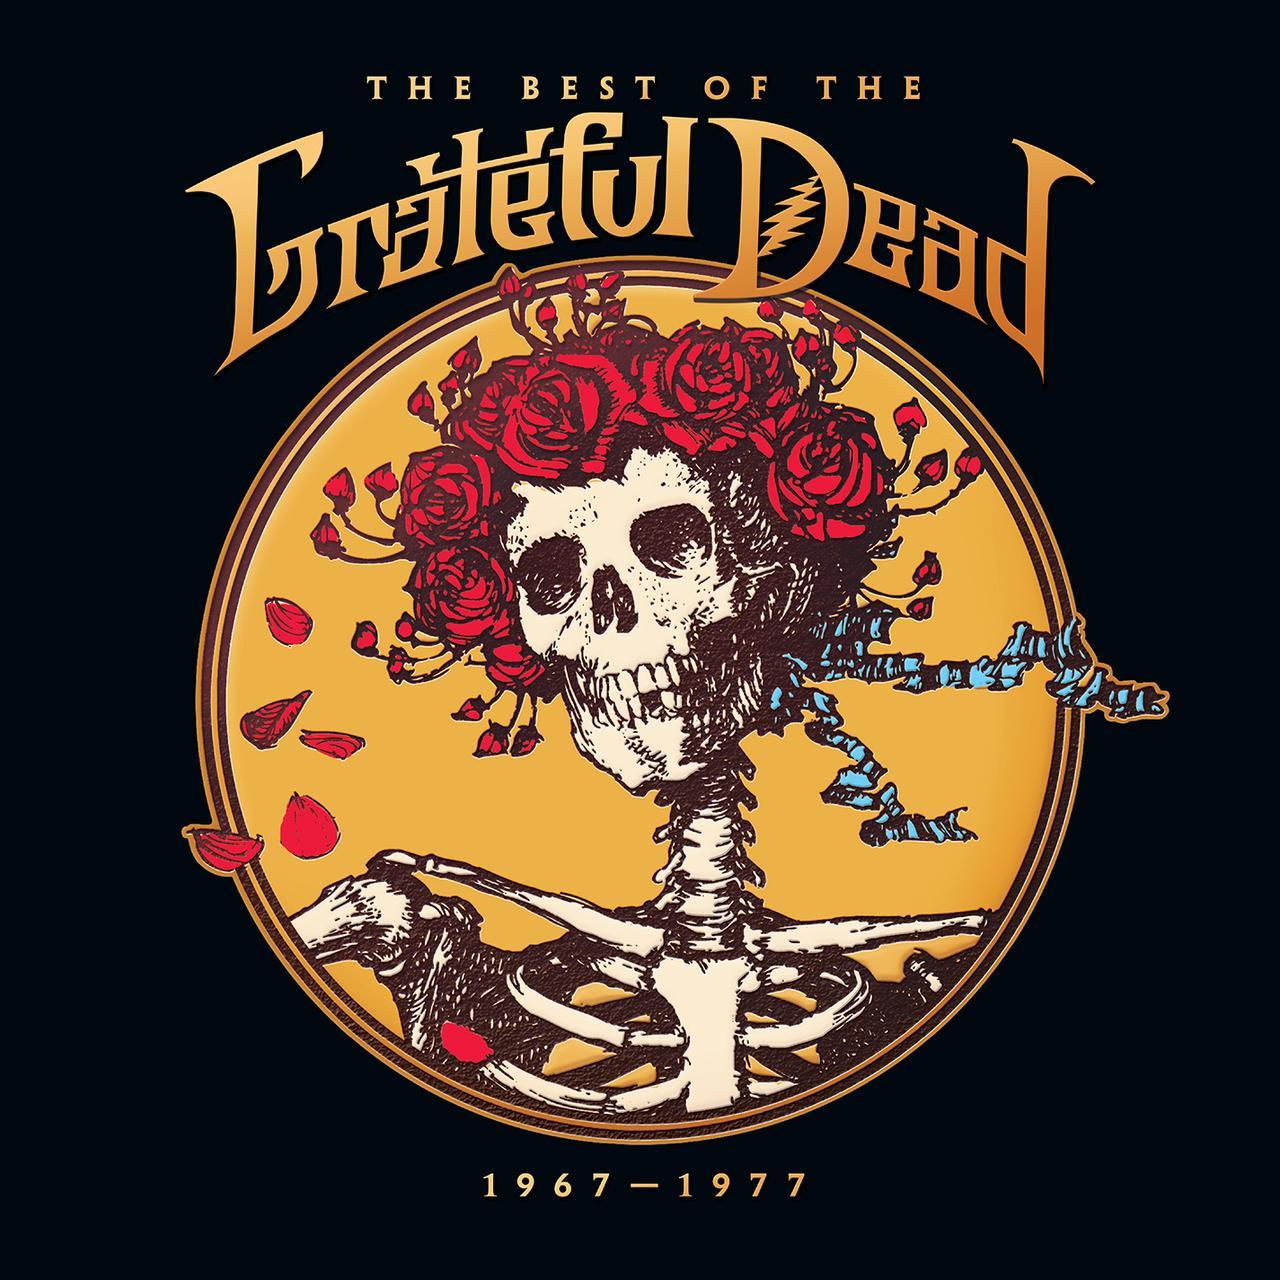 Best Of The Grateful Dead 1967 1977 Vinyl Record